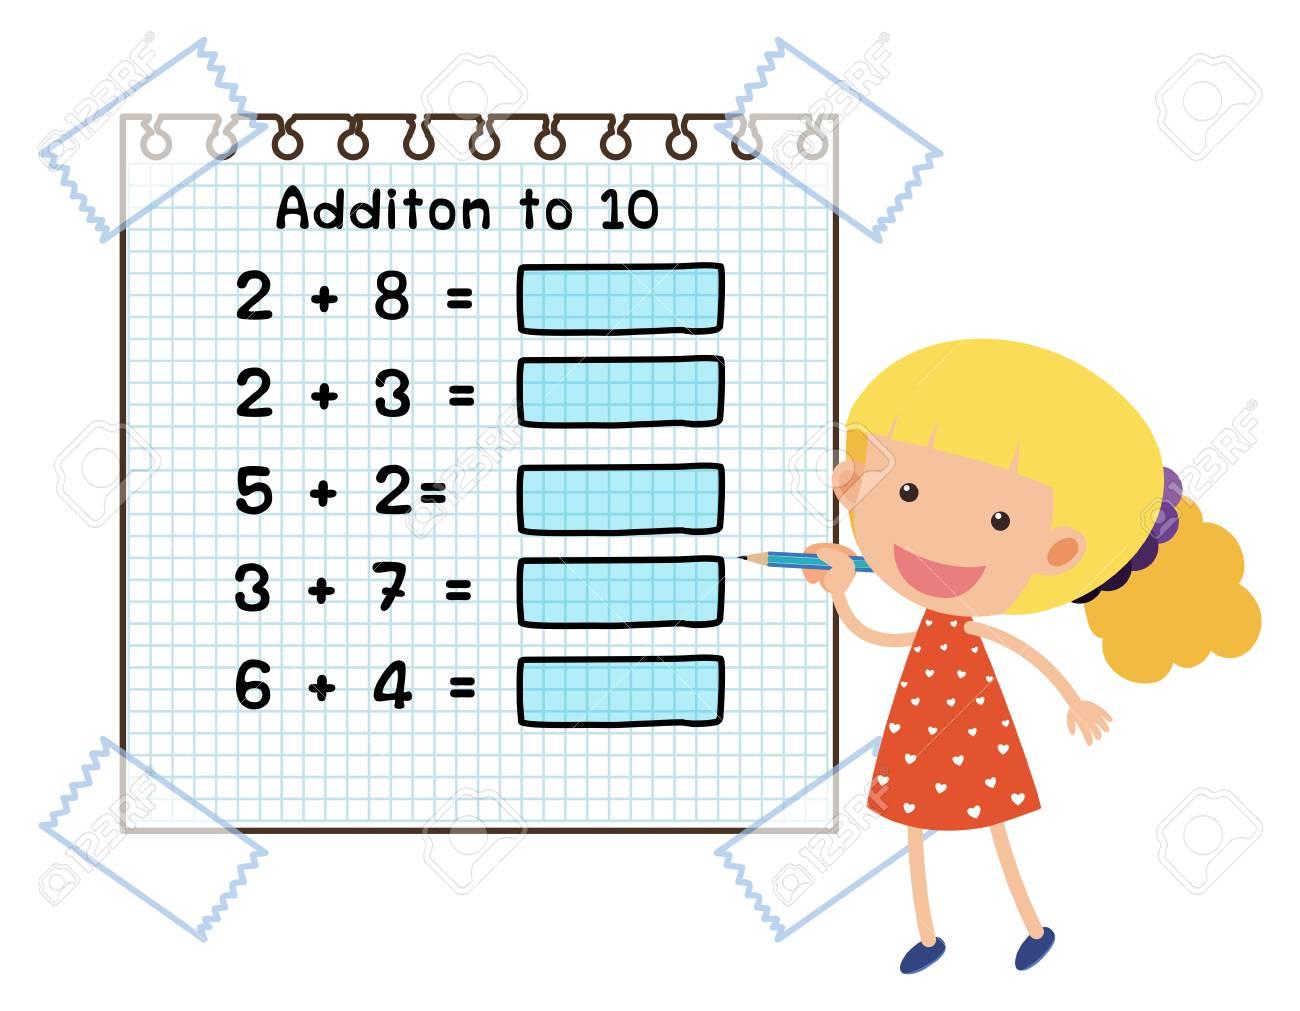 Math worksheet for addition to ten illustration.